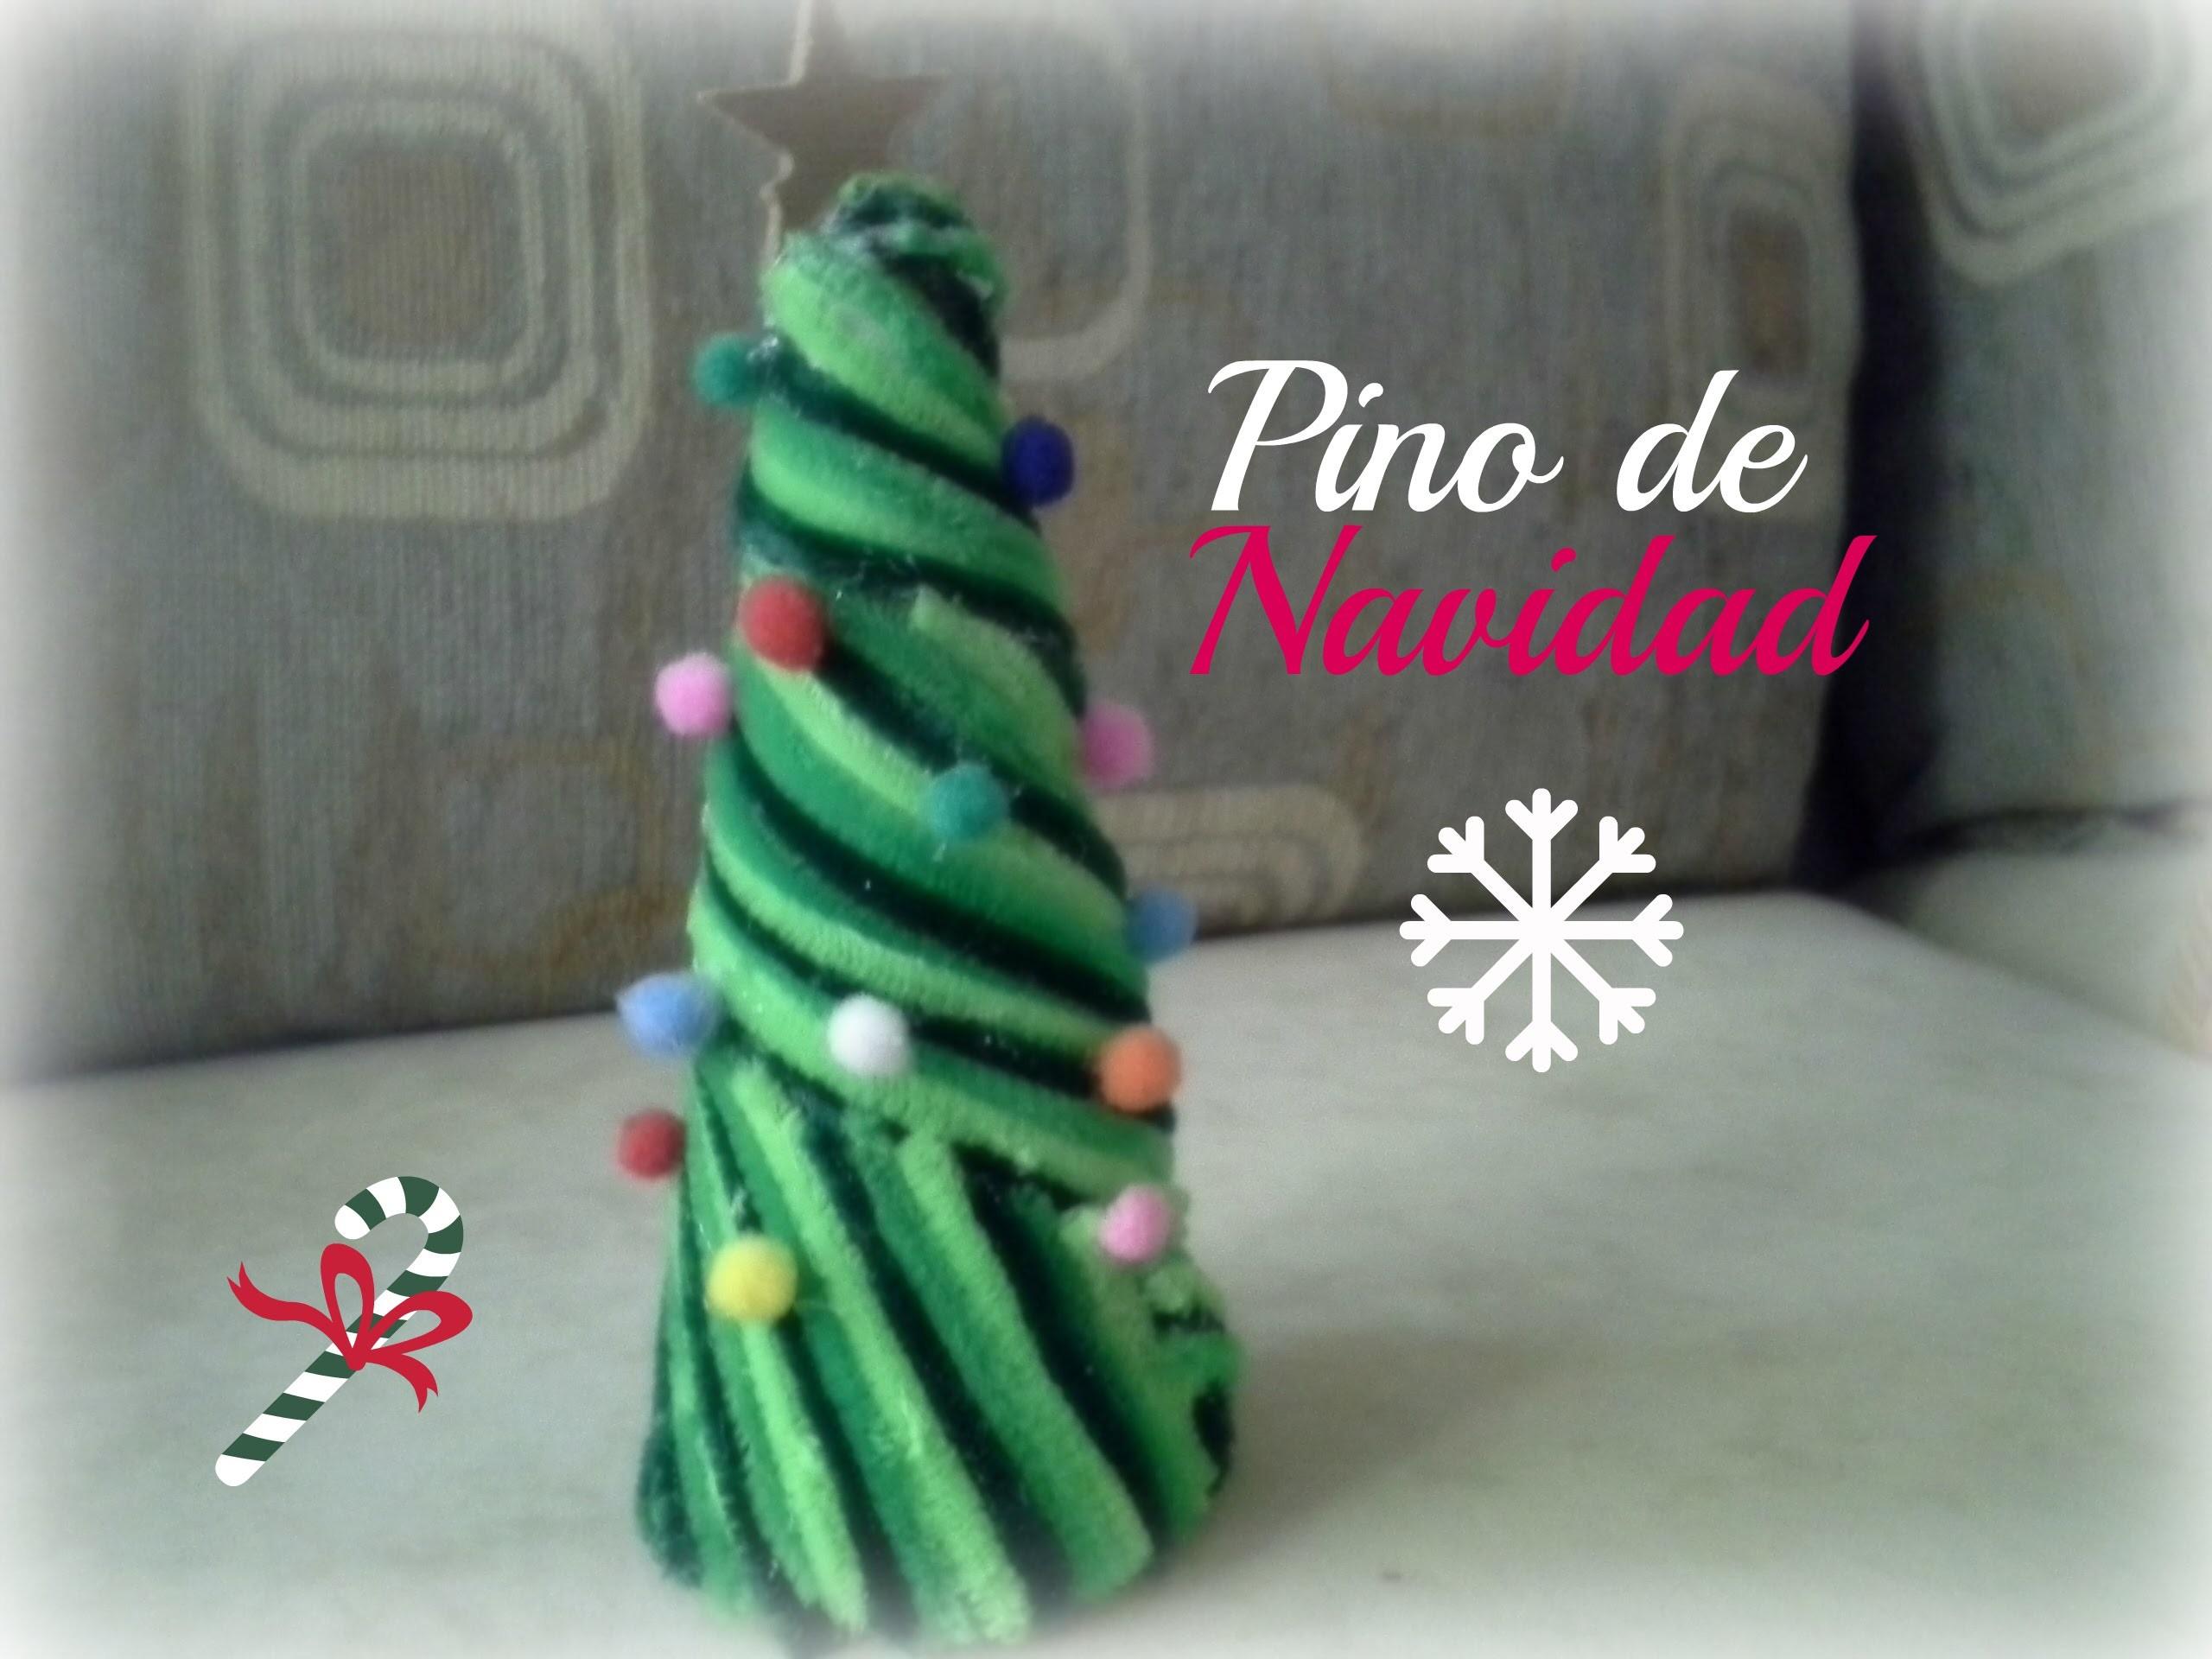 Pino de navidad | Tuto express